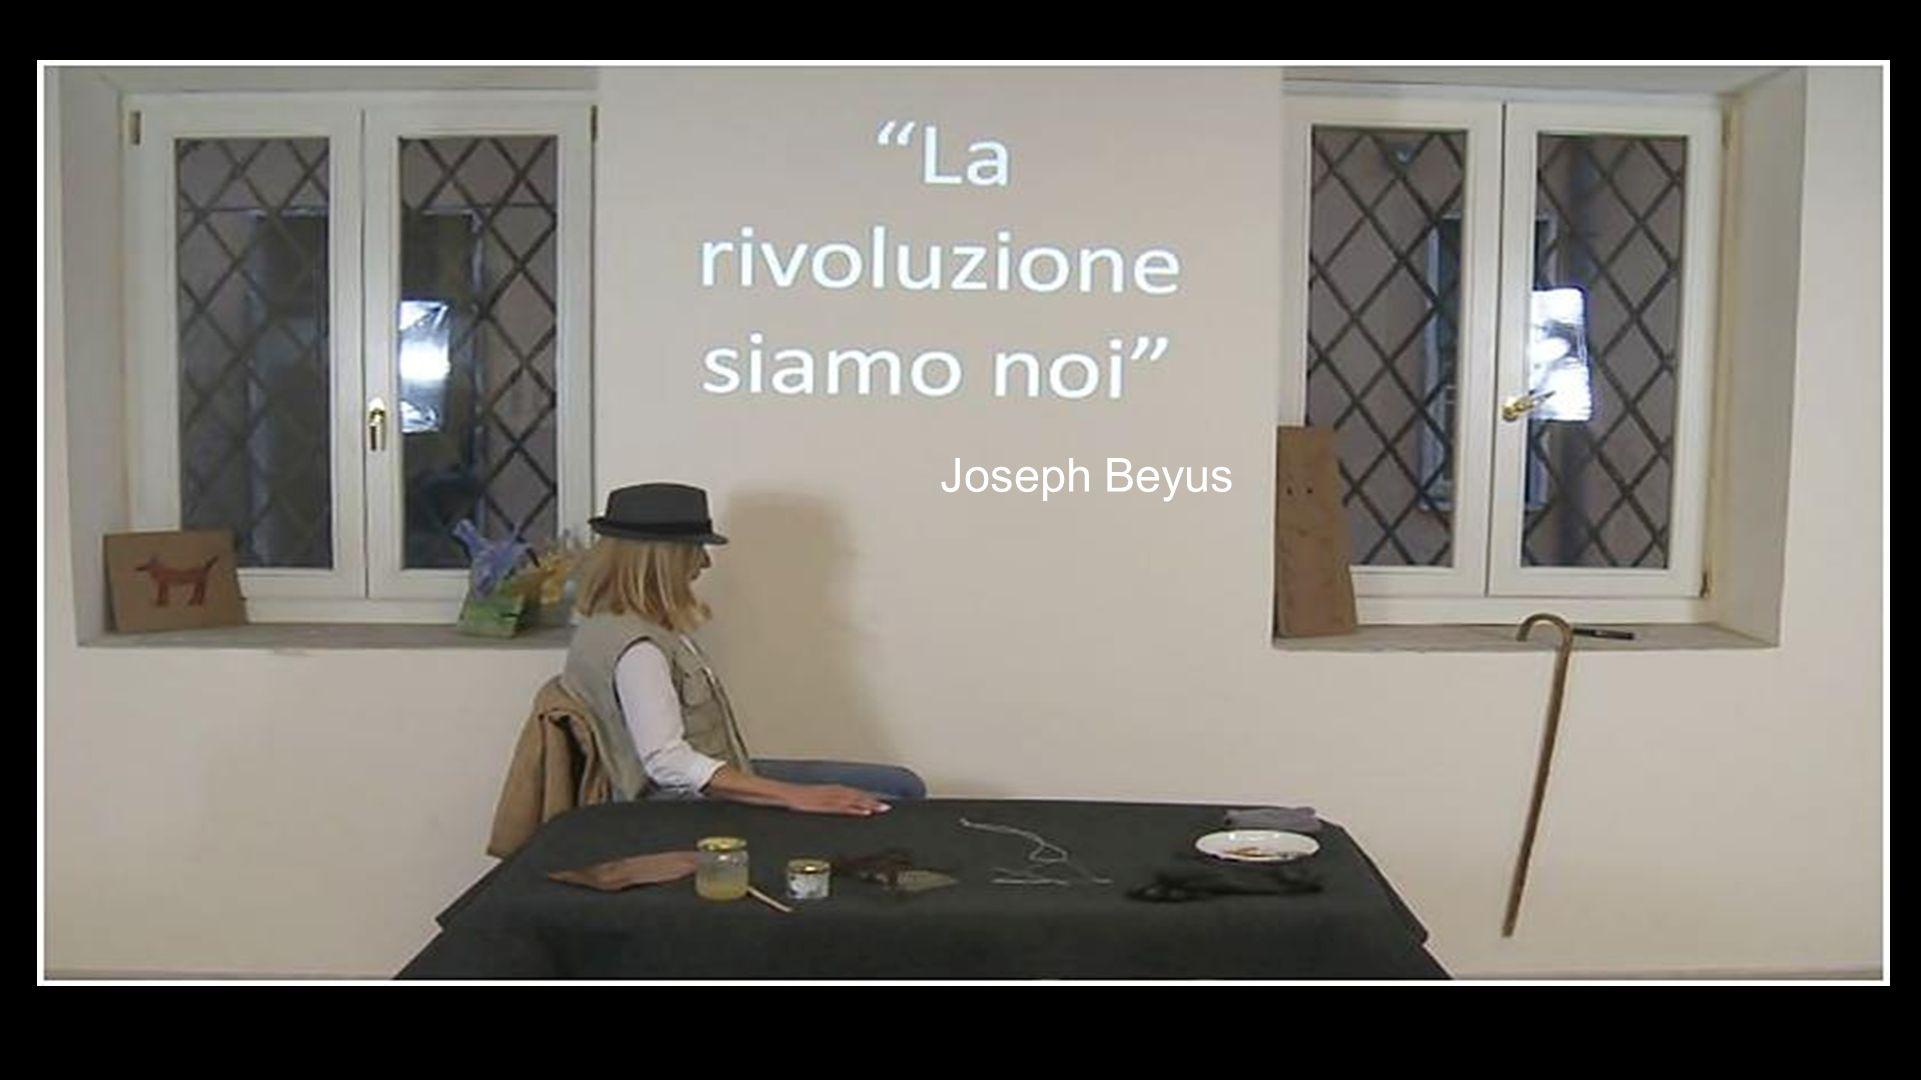 Joseph Beyus